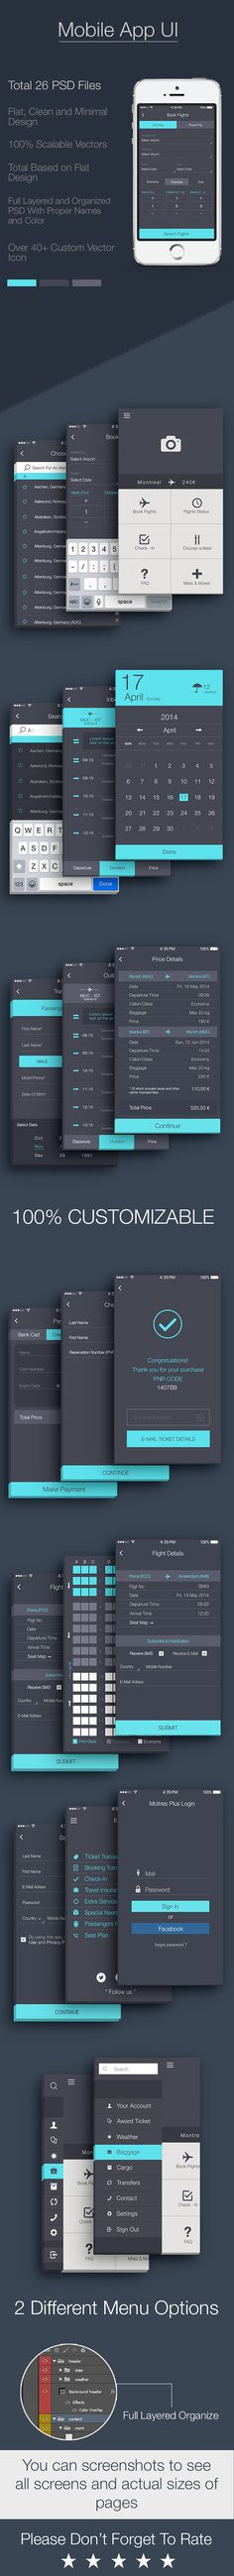 Airlines Mobile App UI on Behance. #Mobile #ui #UserInterface #Design